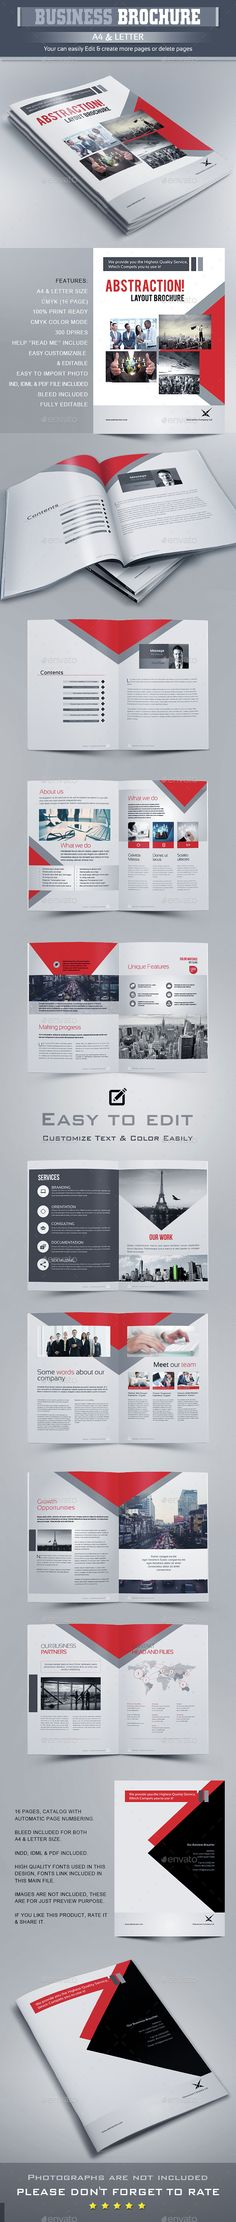 Brochure Template InDesign INDD. Download here: http://graphicriver.net/item/brochure-template/14669122?ref=ksioks